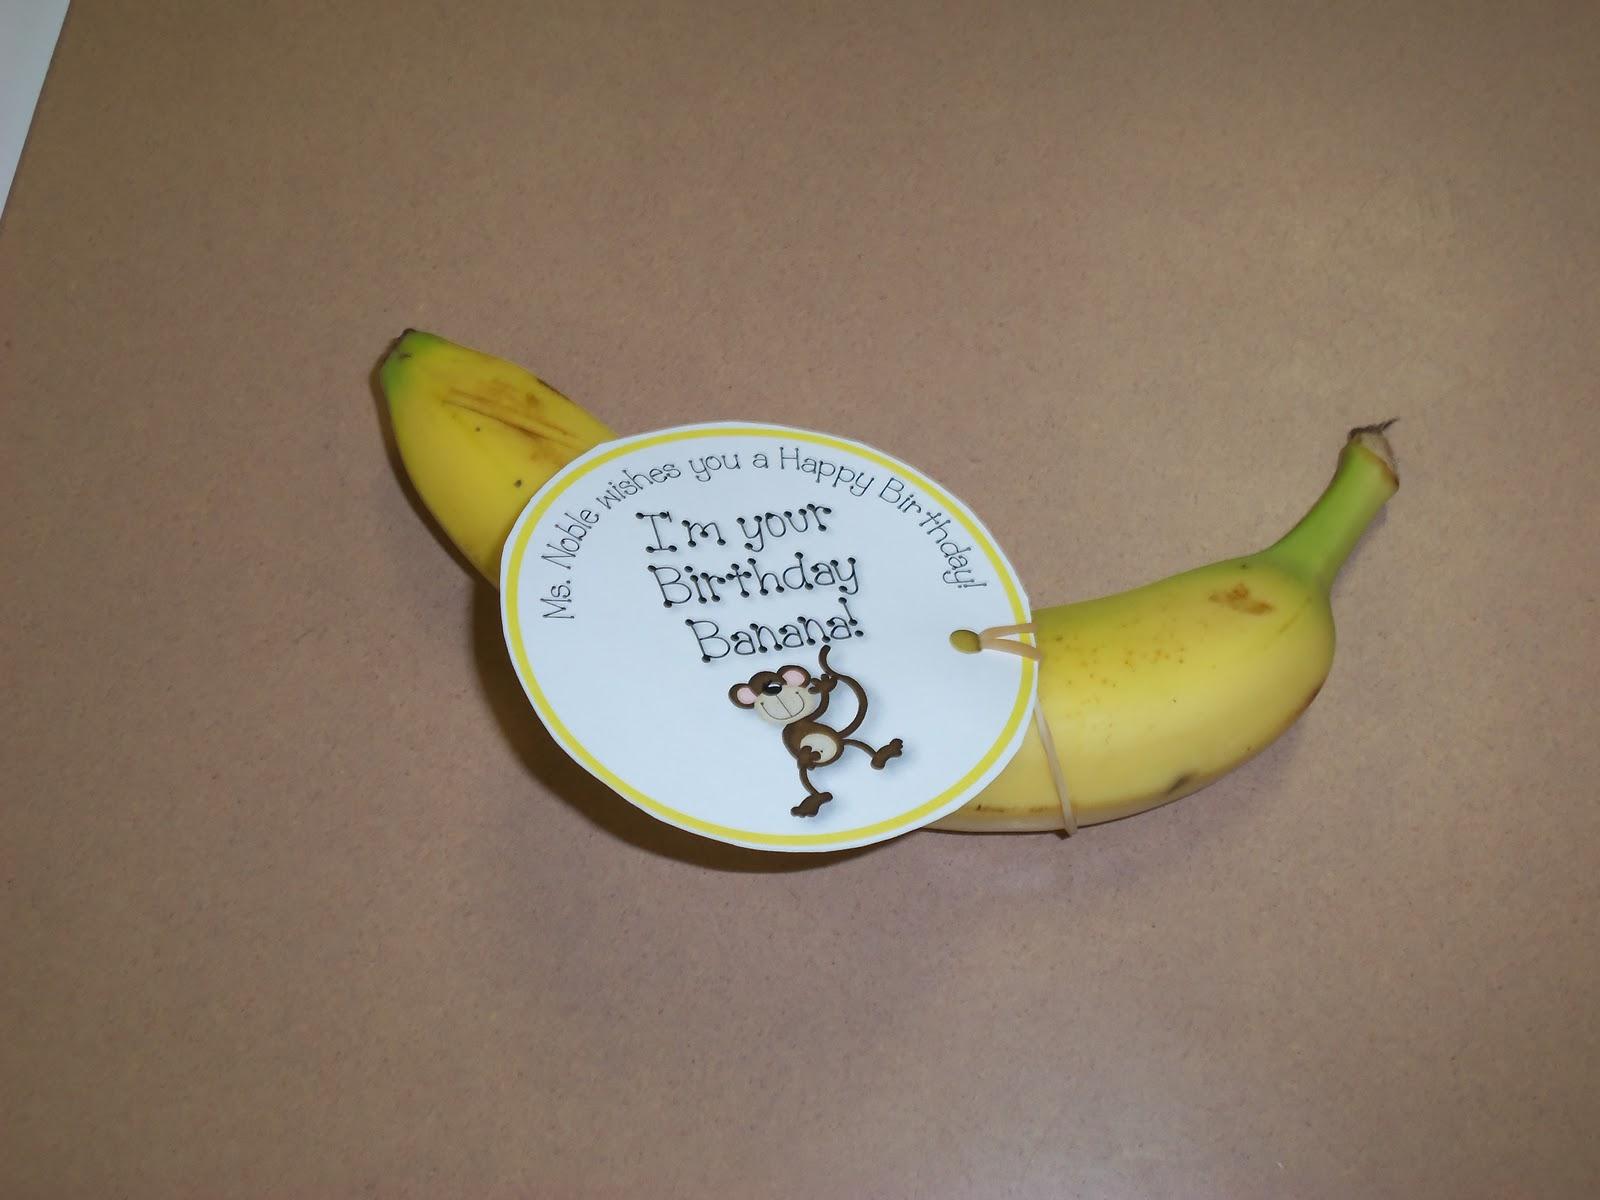 Happy Birthday! - The First Grade Parade